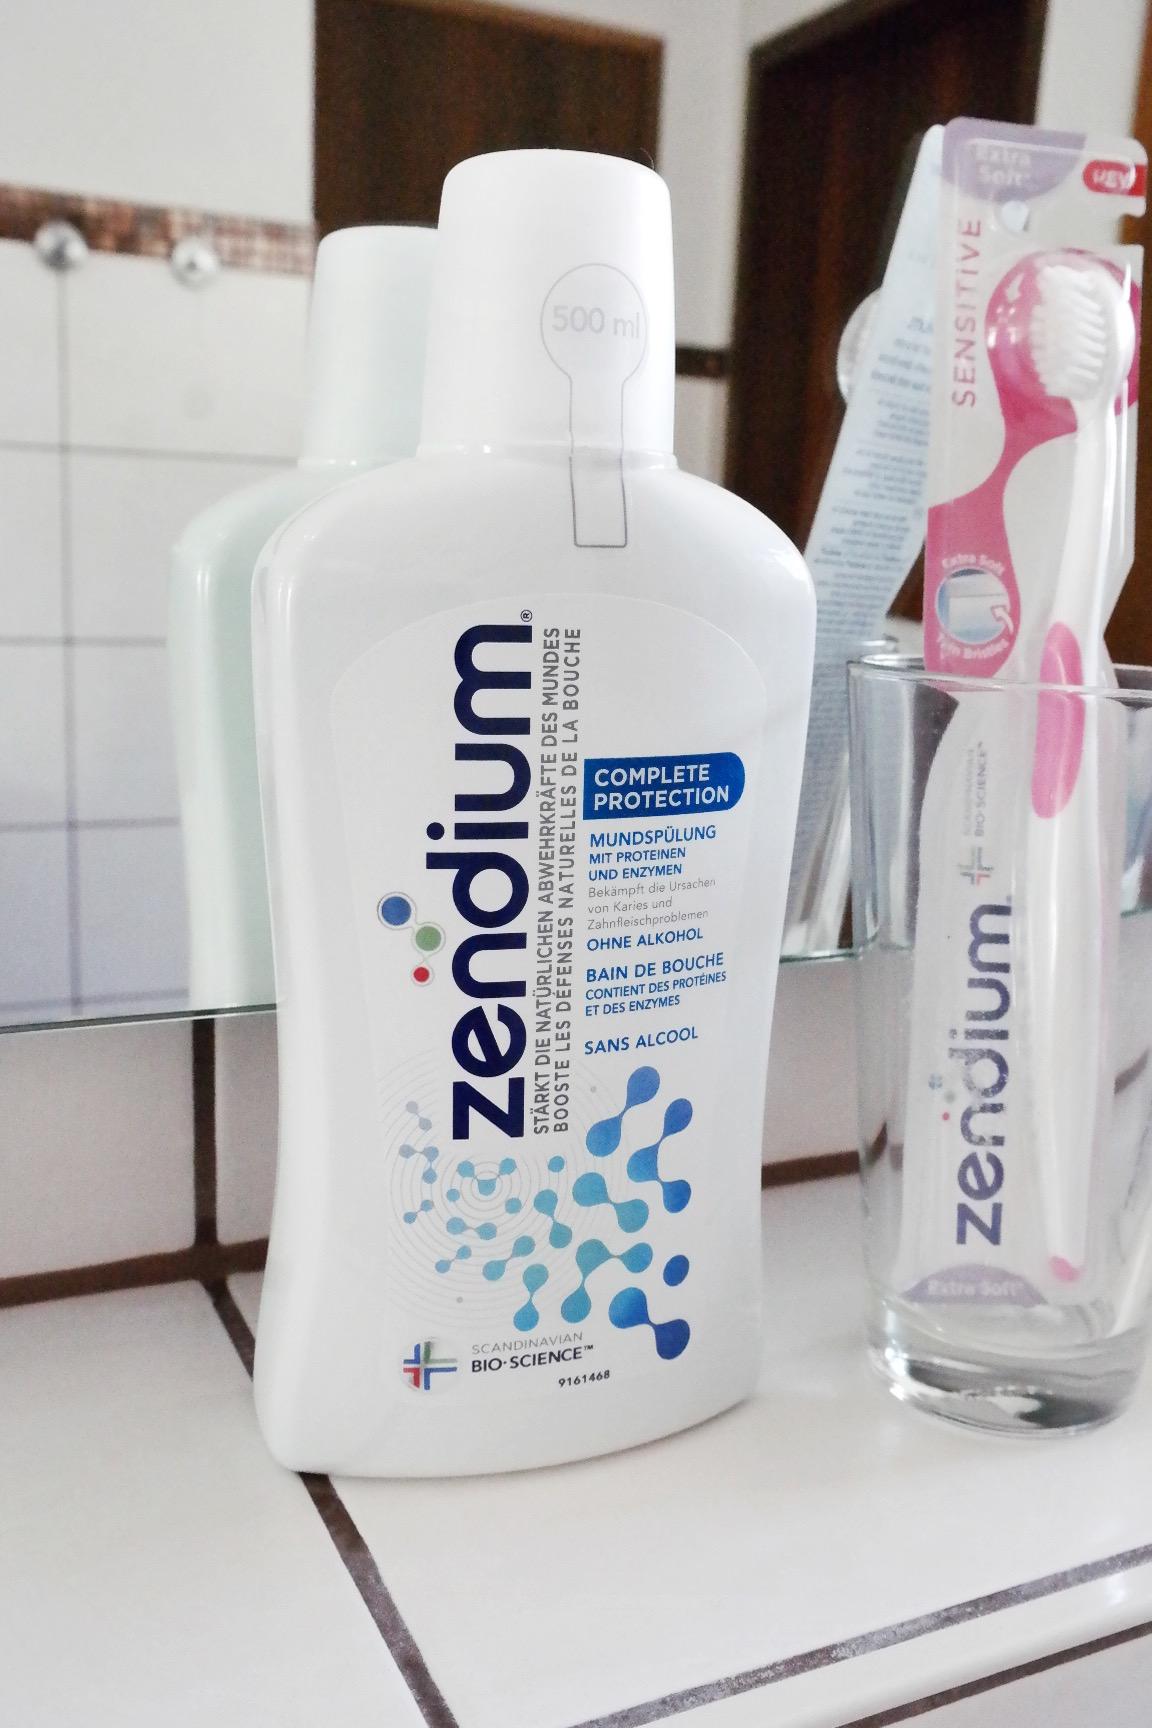 missbonnebonne-morning-routine-zaehneputzen-zahnpflege-zahnpasta-zendium-4